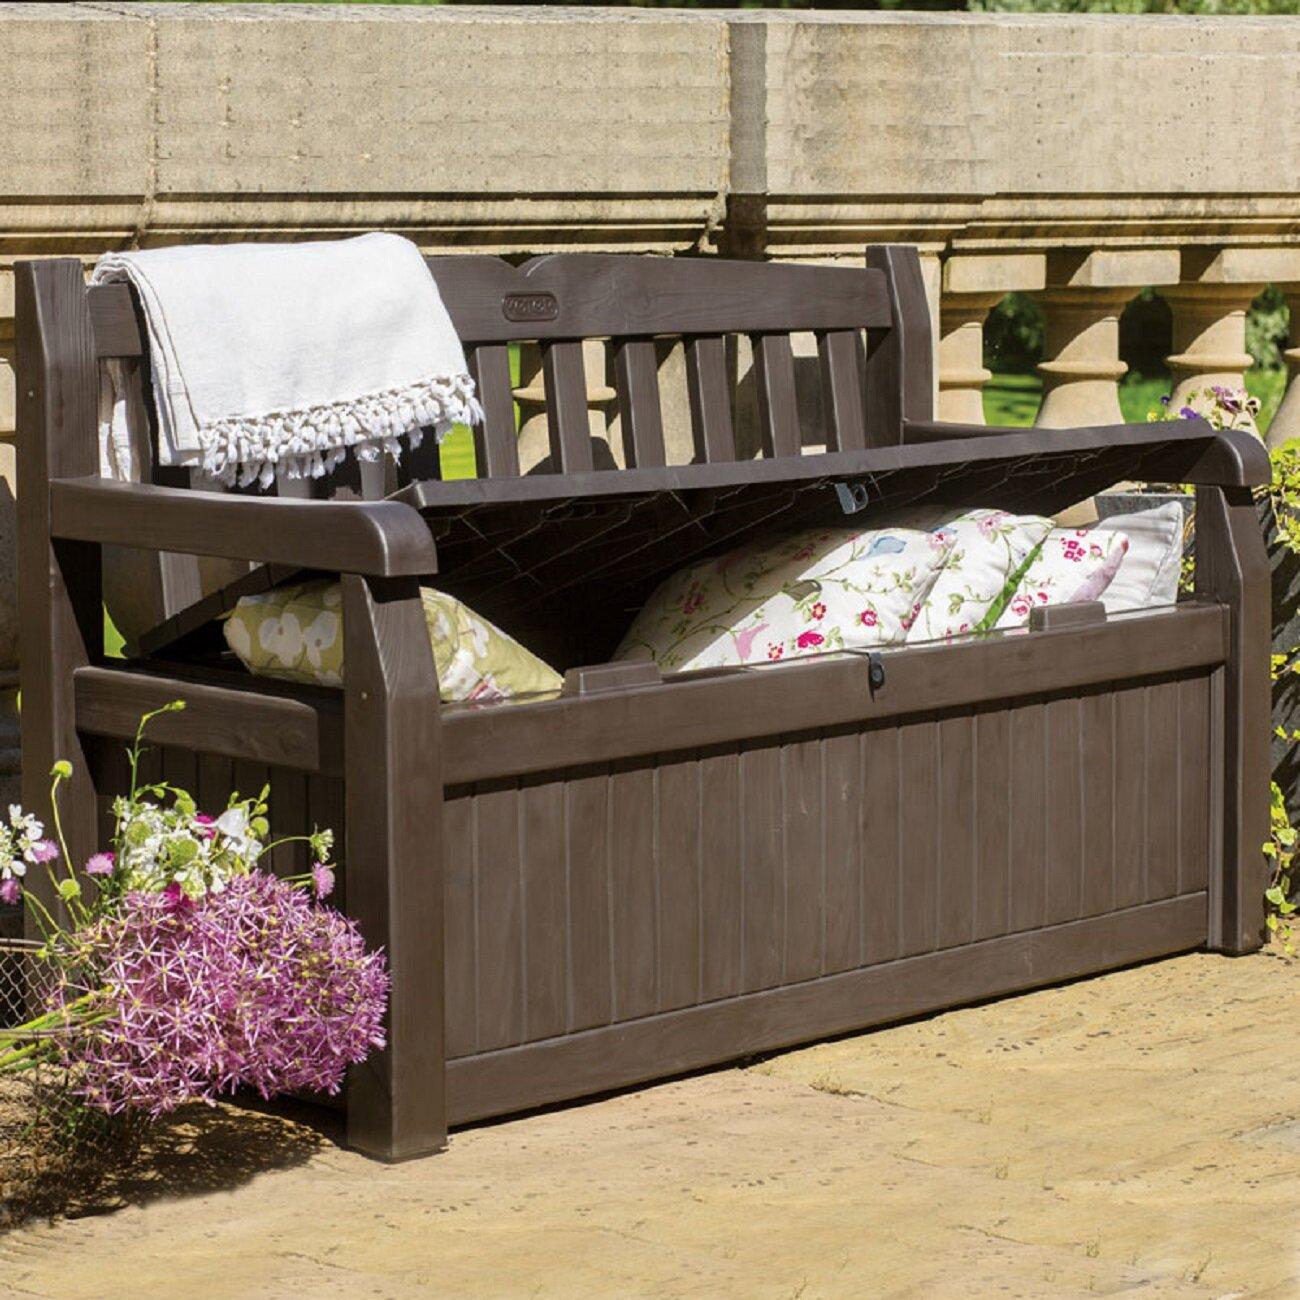 Crib Bench Toy Box